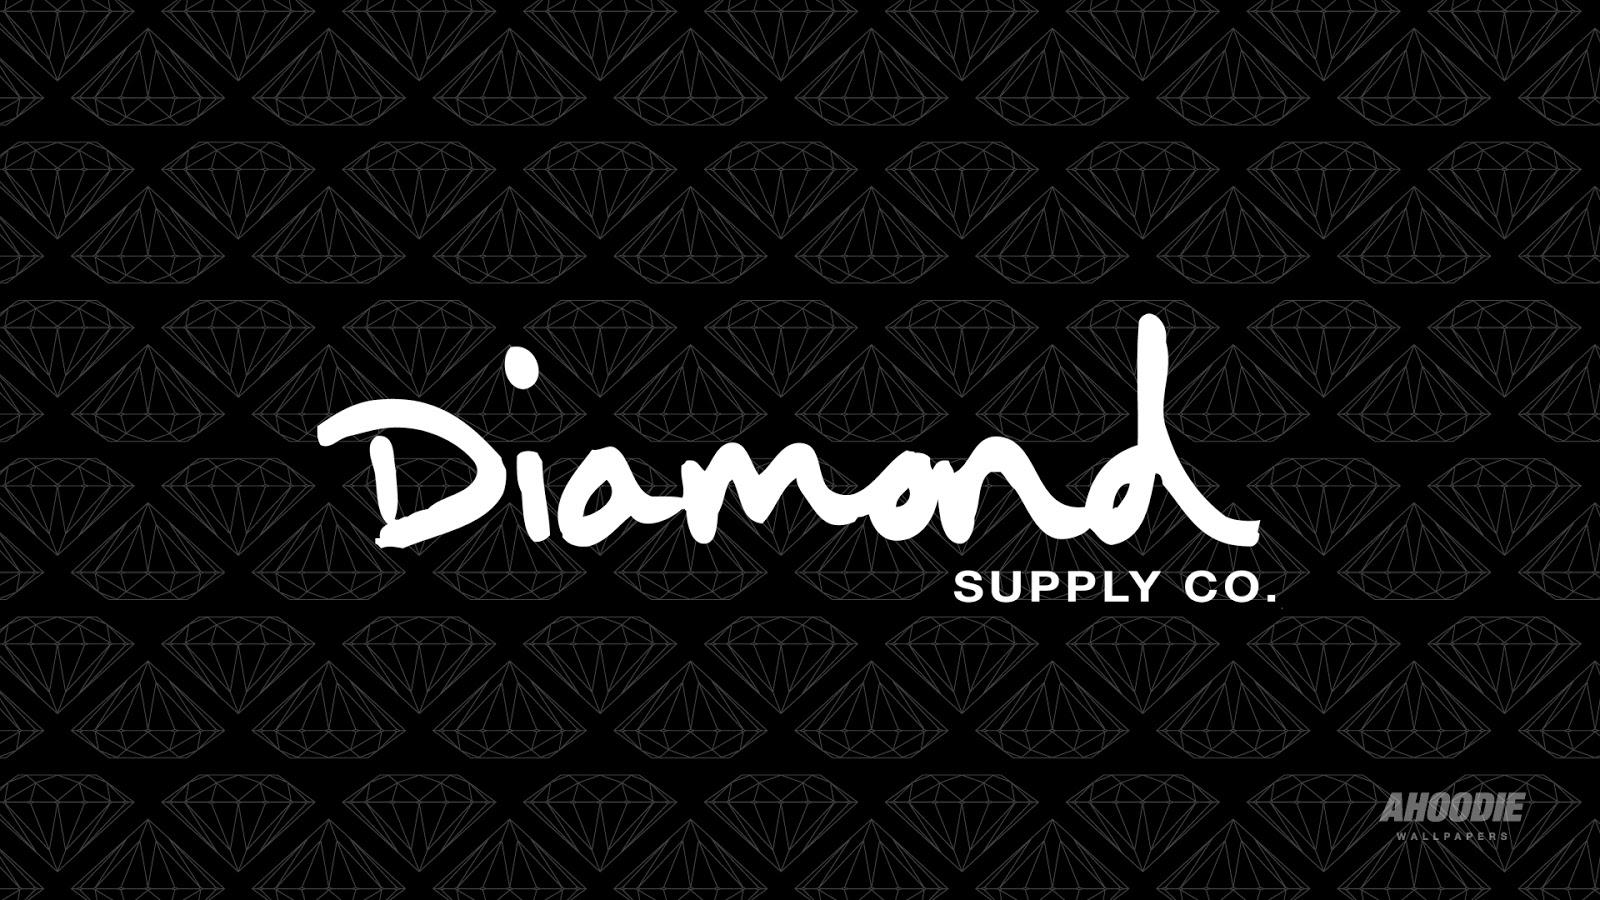 diamond logo wallpaper - photo #20